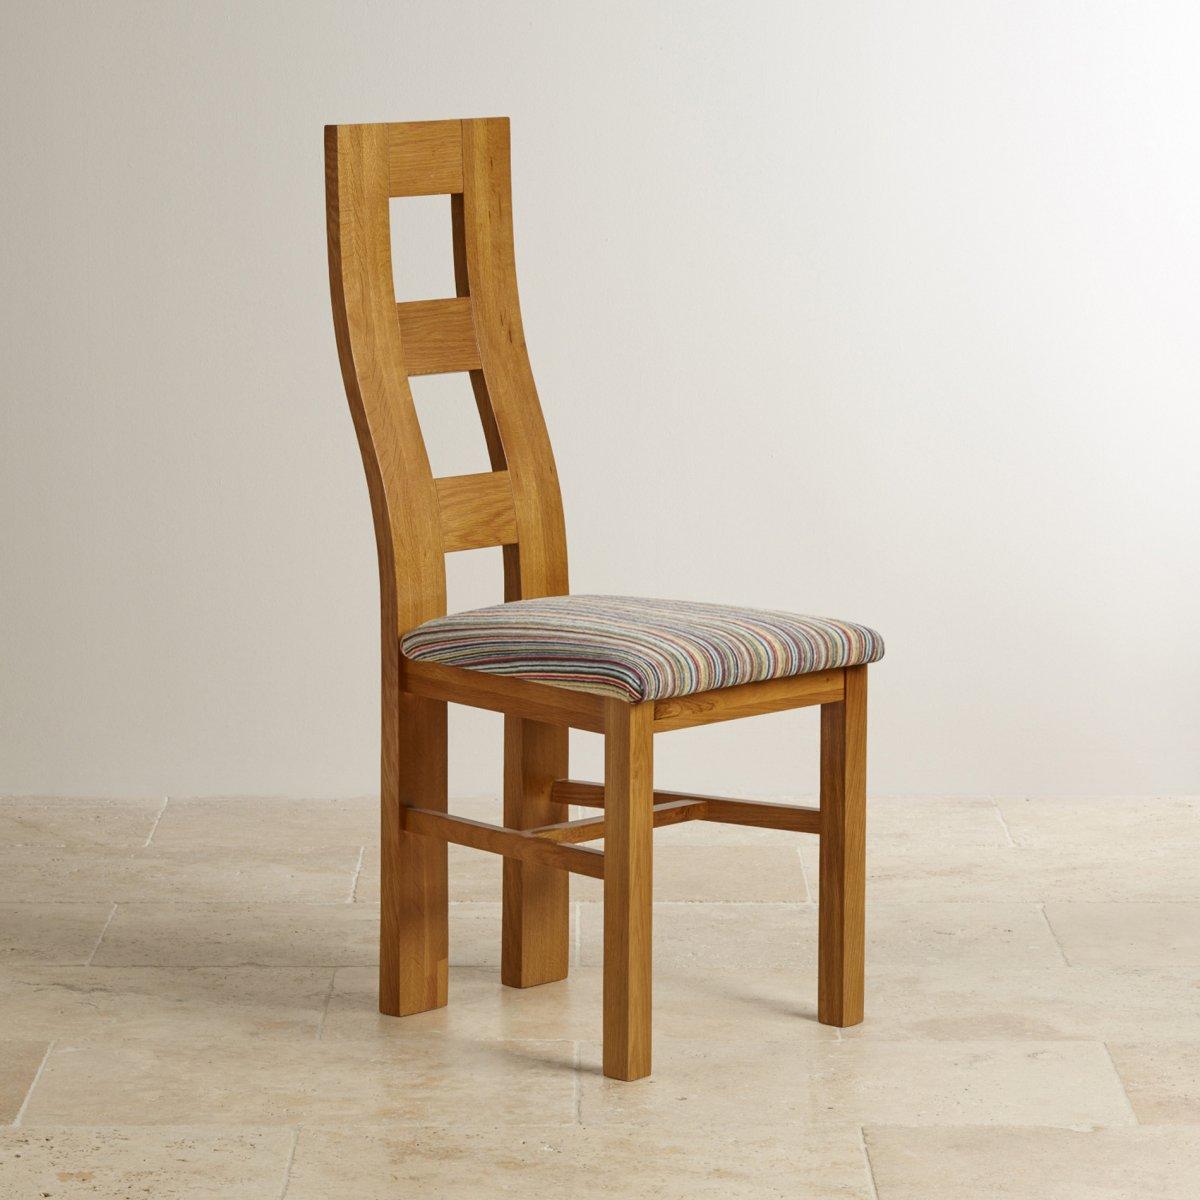 Wave Back Dining Chair in Rustic Oak Multi Striped Fabric : wave back rustic solid oak and striped multi coloured fabric chair 567aeecb4f4f7b92786a43a58162cfbab86a73b2e97a3 from www.oakfurnitureland.co.uk size 1200 x 1200 jpeg 128kB